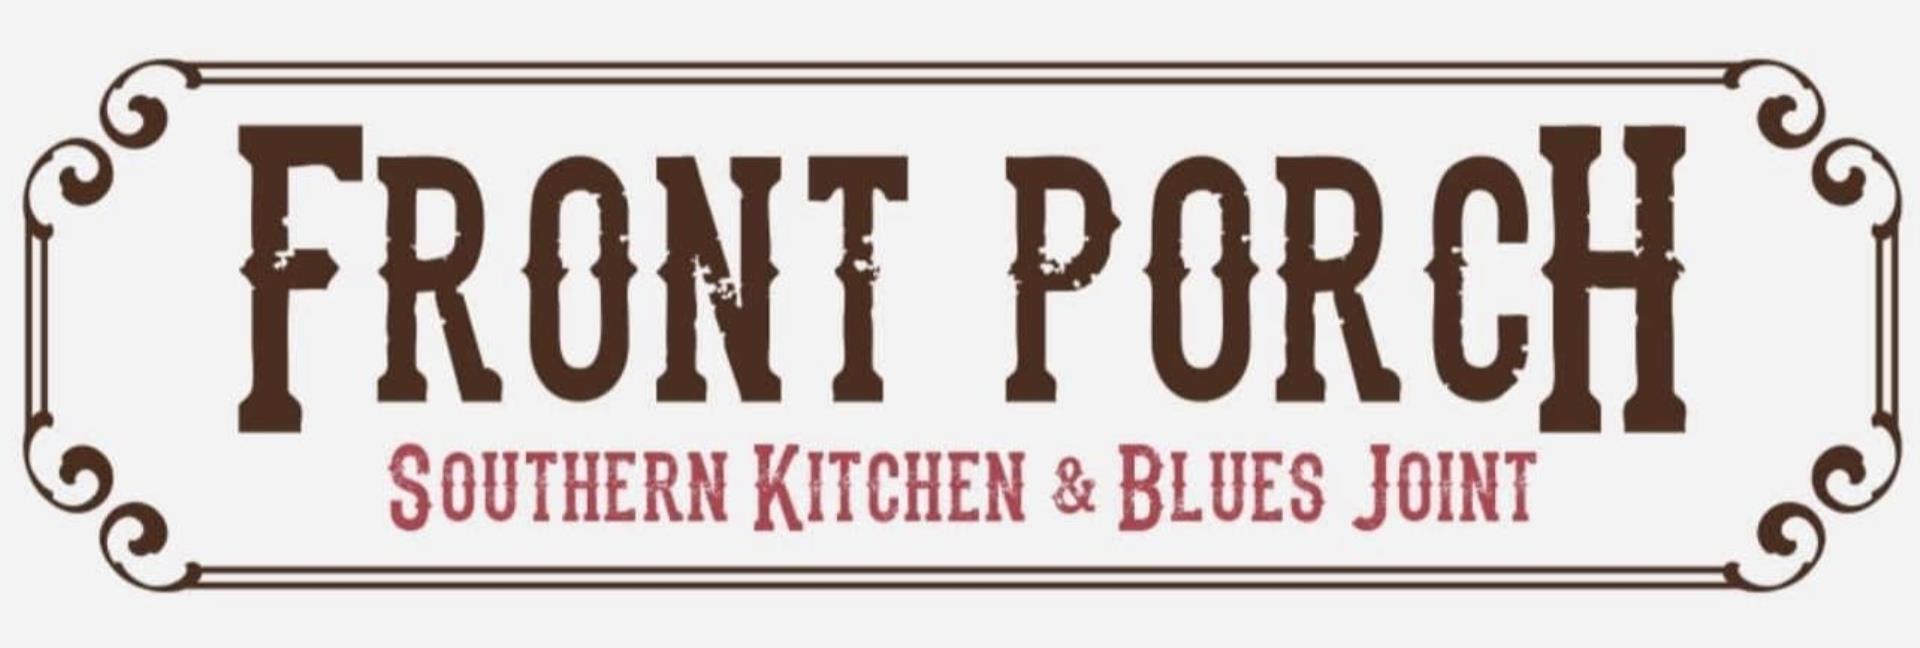 Front Porch Restaurant - Picture